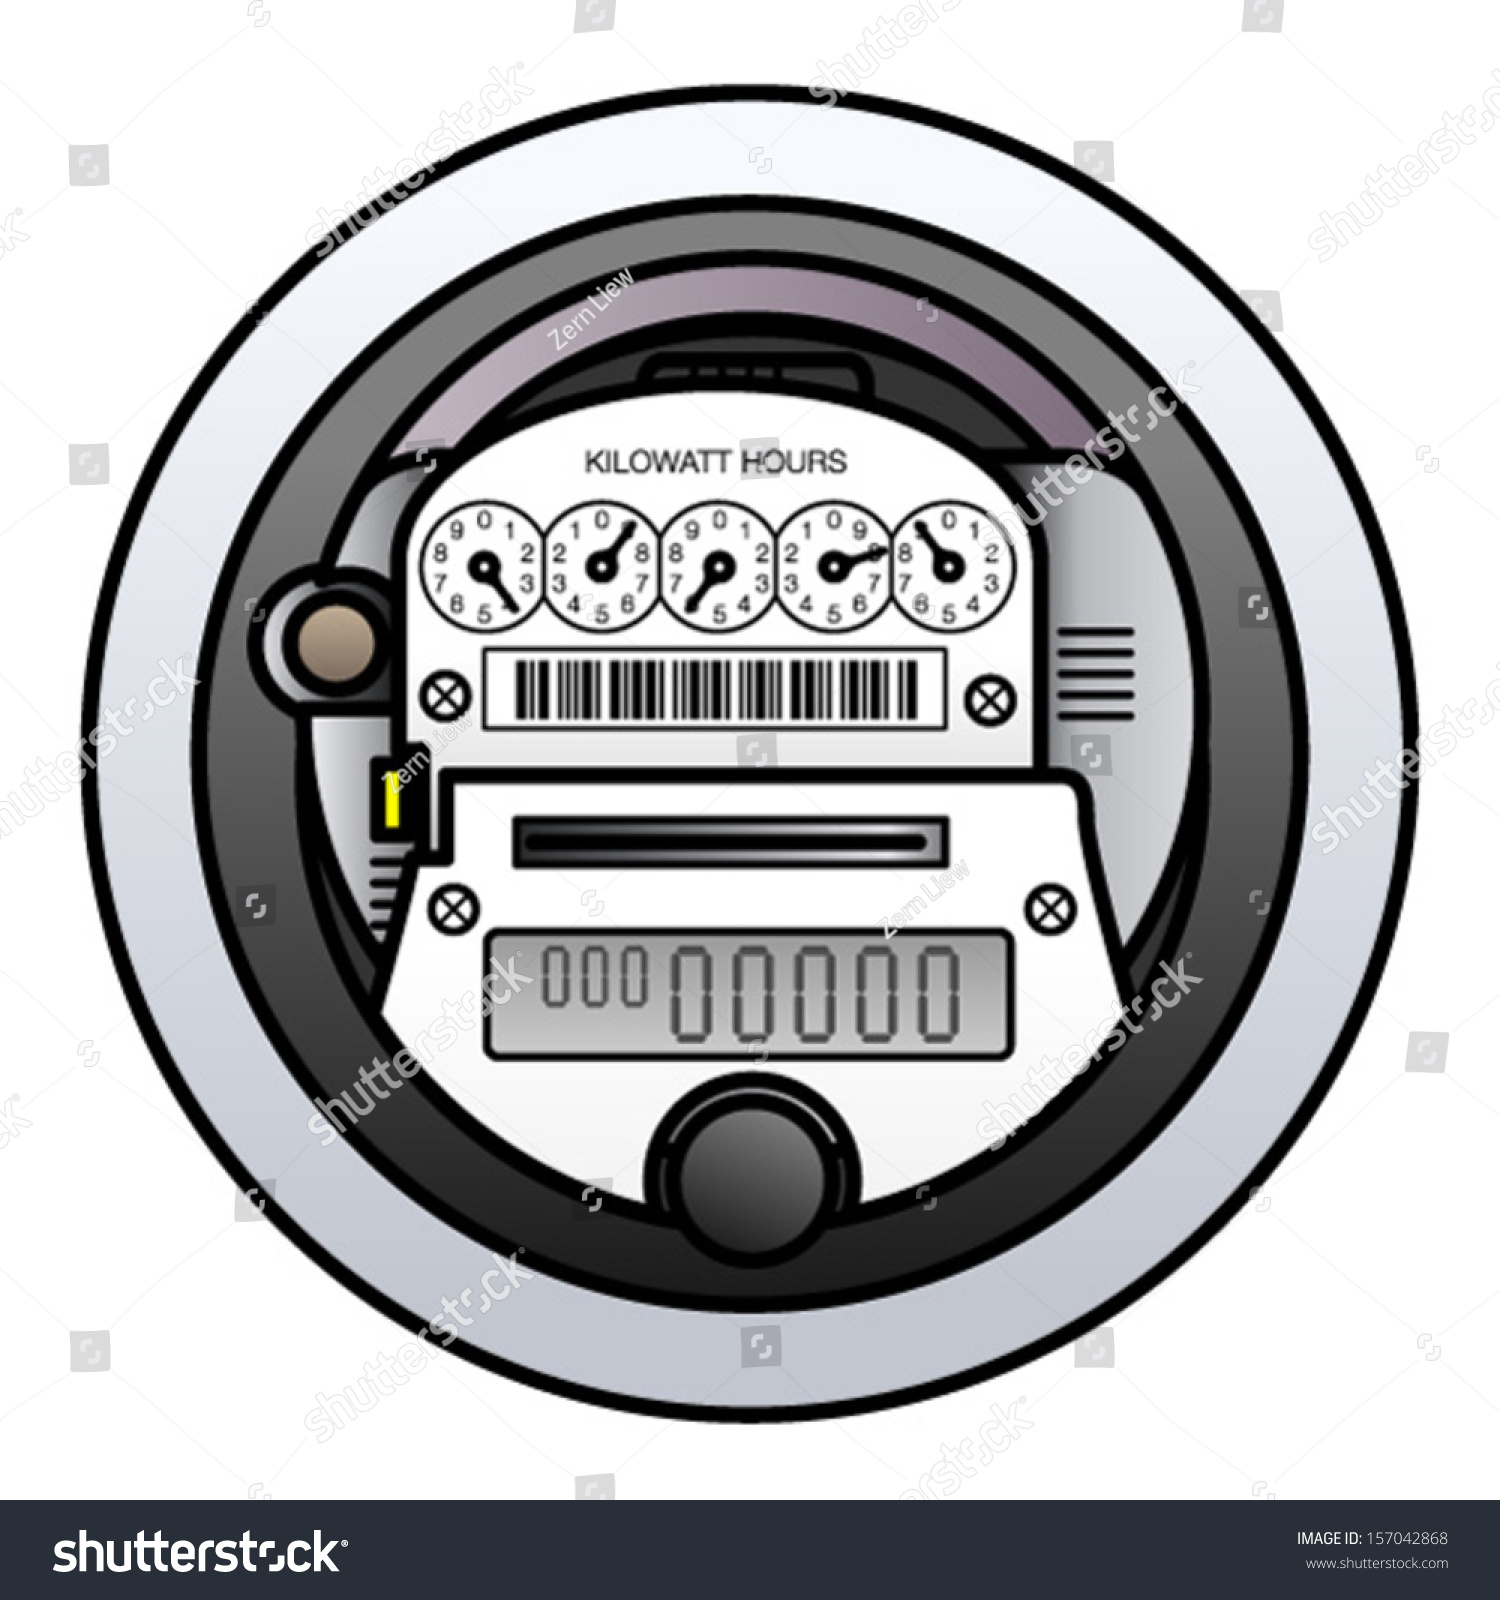 Household Energy Meter : Household electricity power meter stock vector